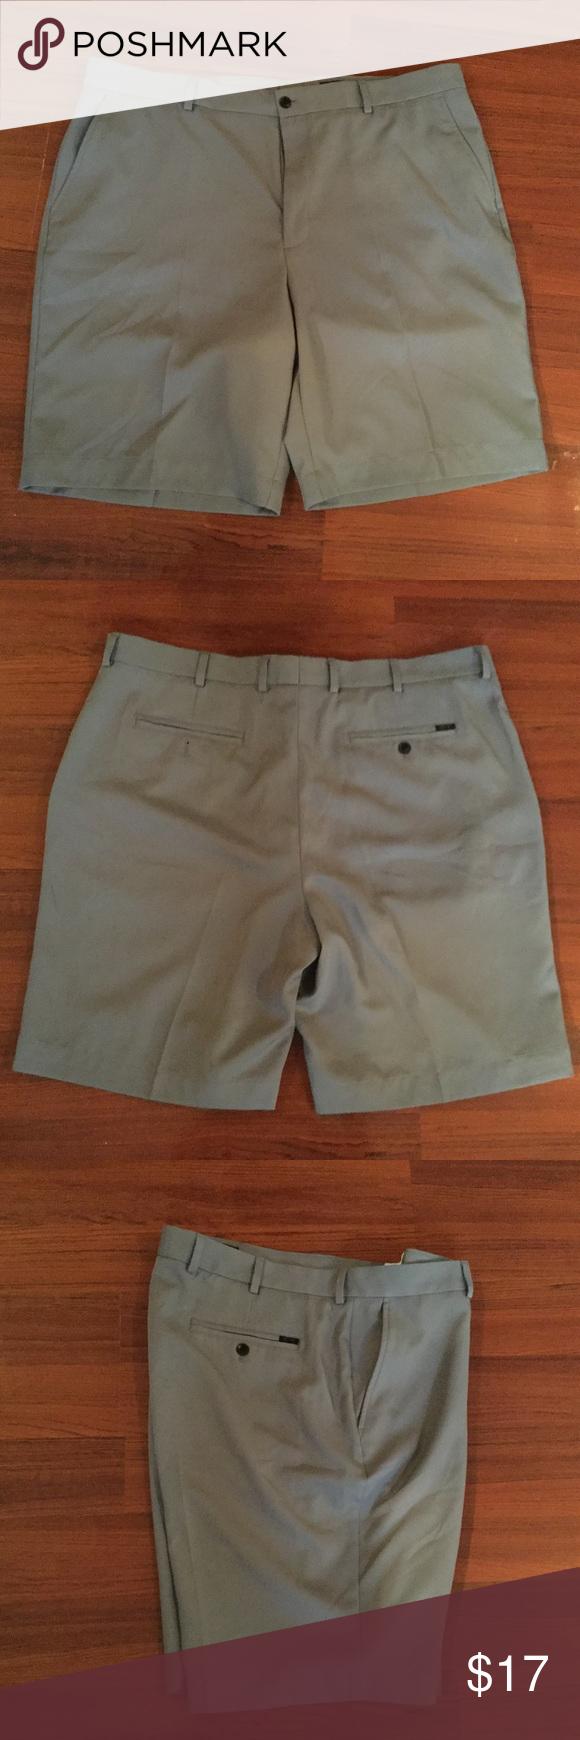 Greg Norman Shorts Greg Norman Shorts Golf Shorts